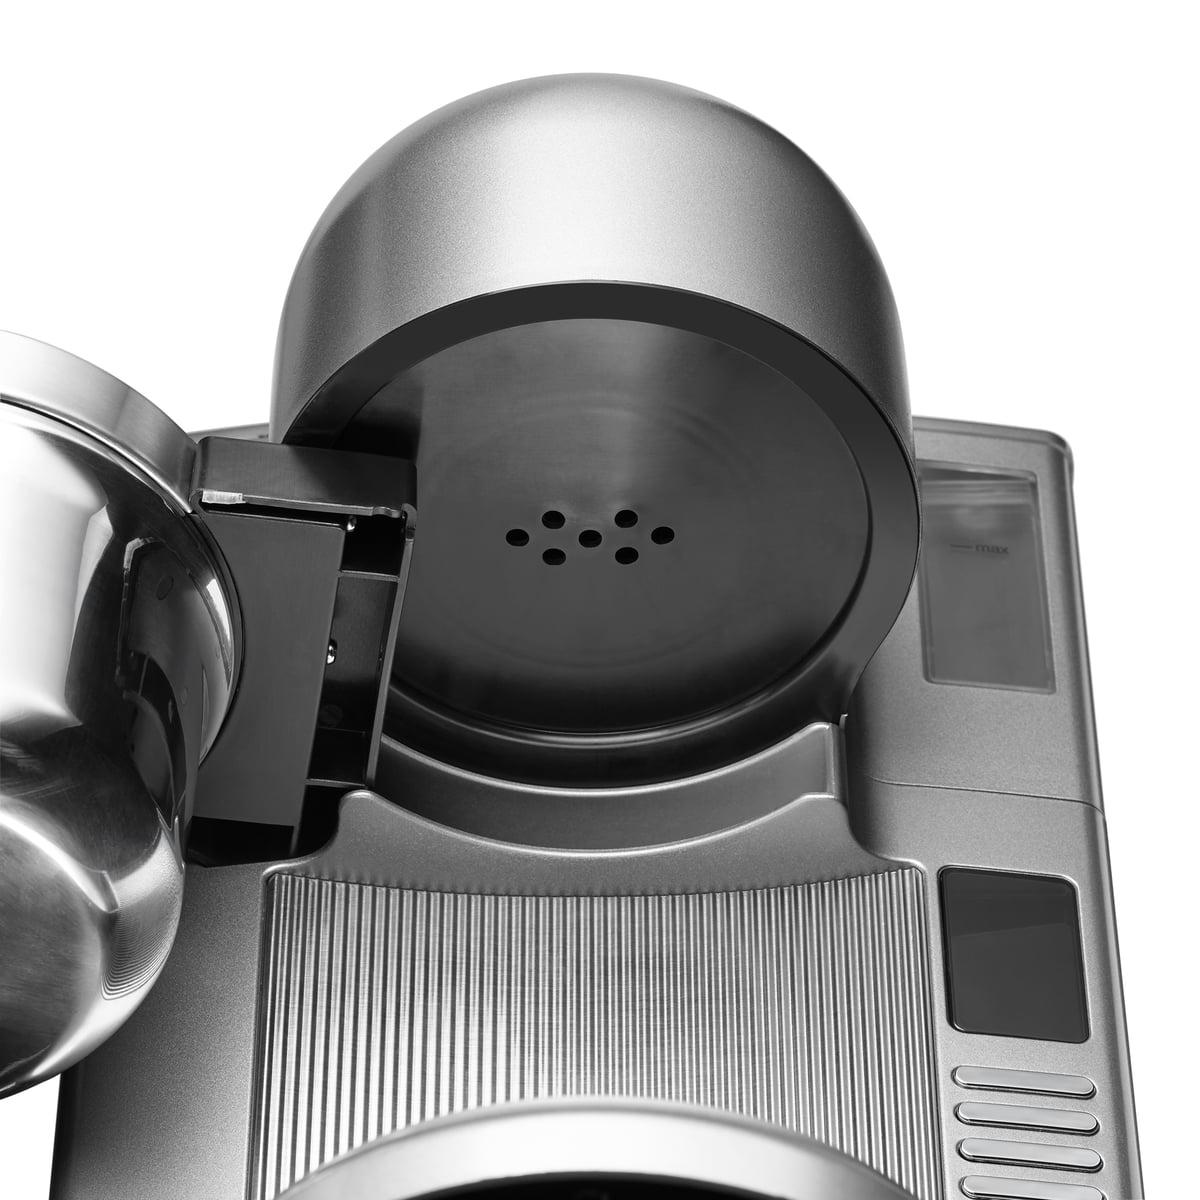 Coffee Machine 118 l by KitchenAid